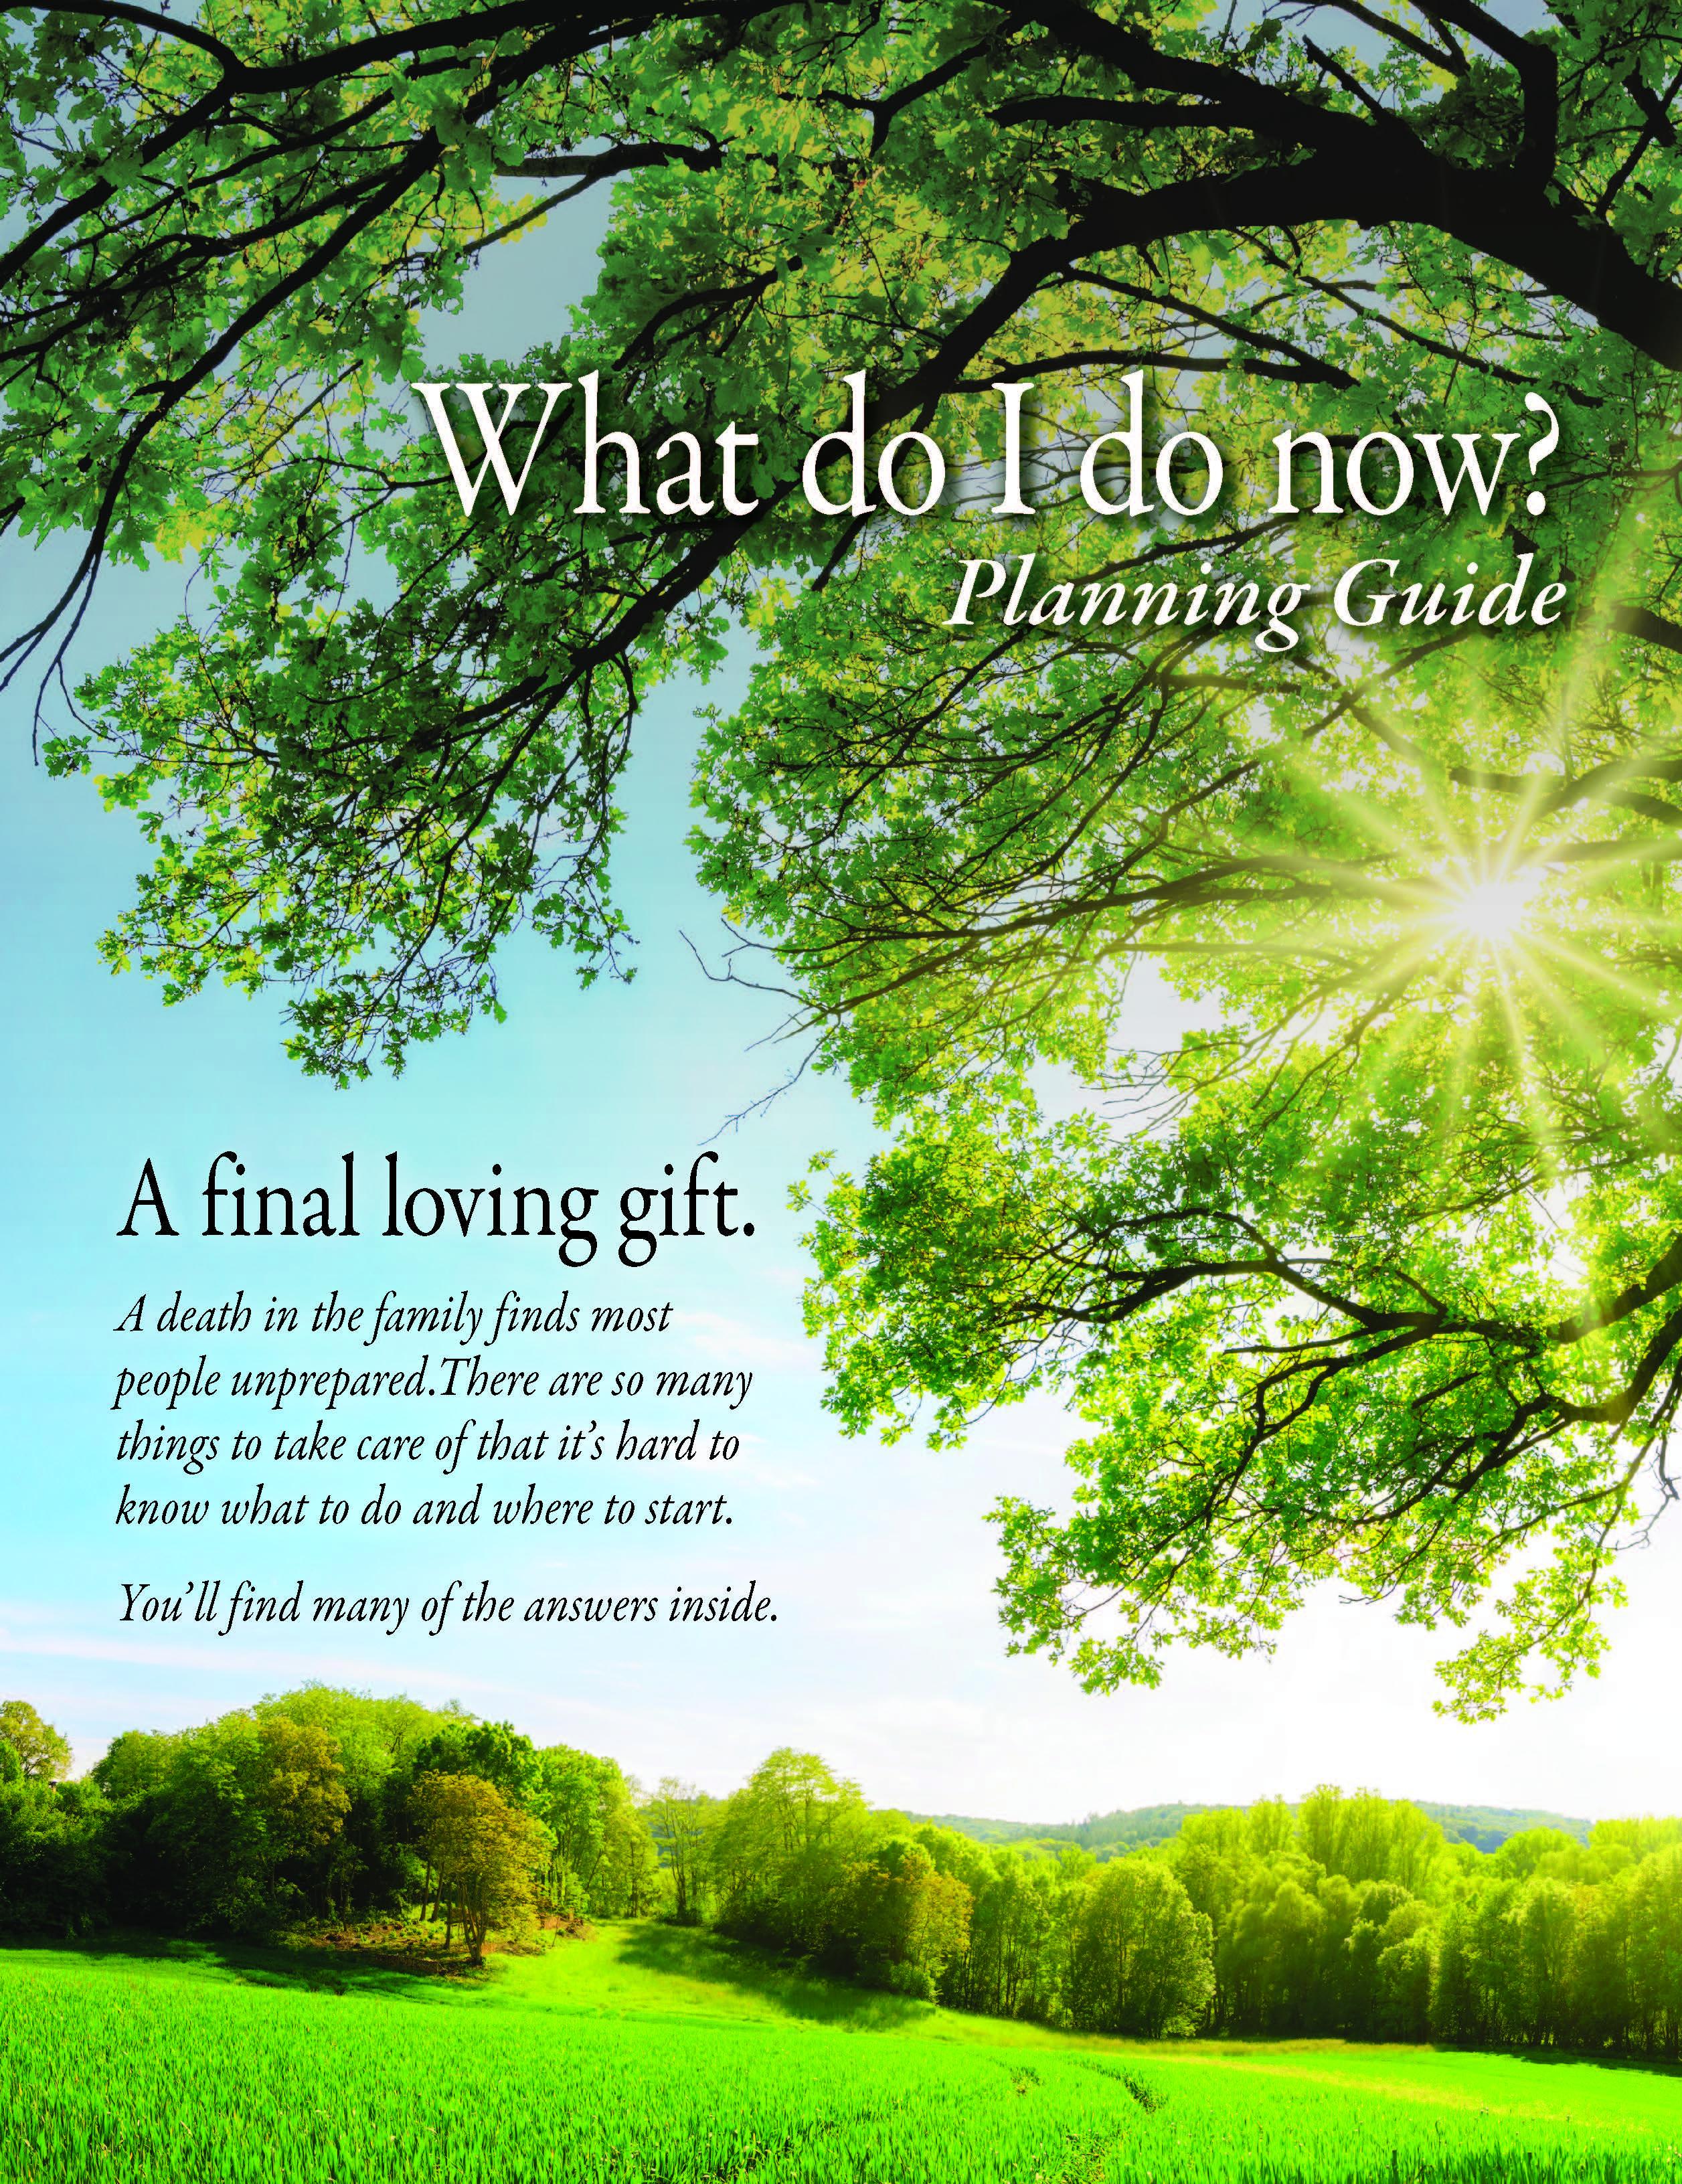 Planning Guide - What do I do now? (Blue Sky)